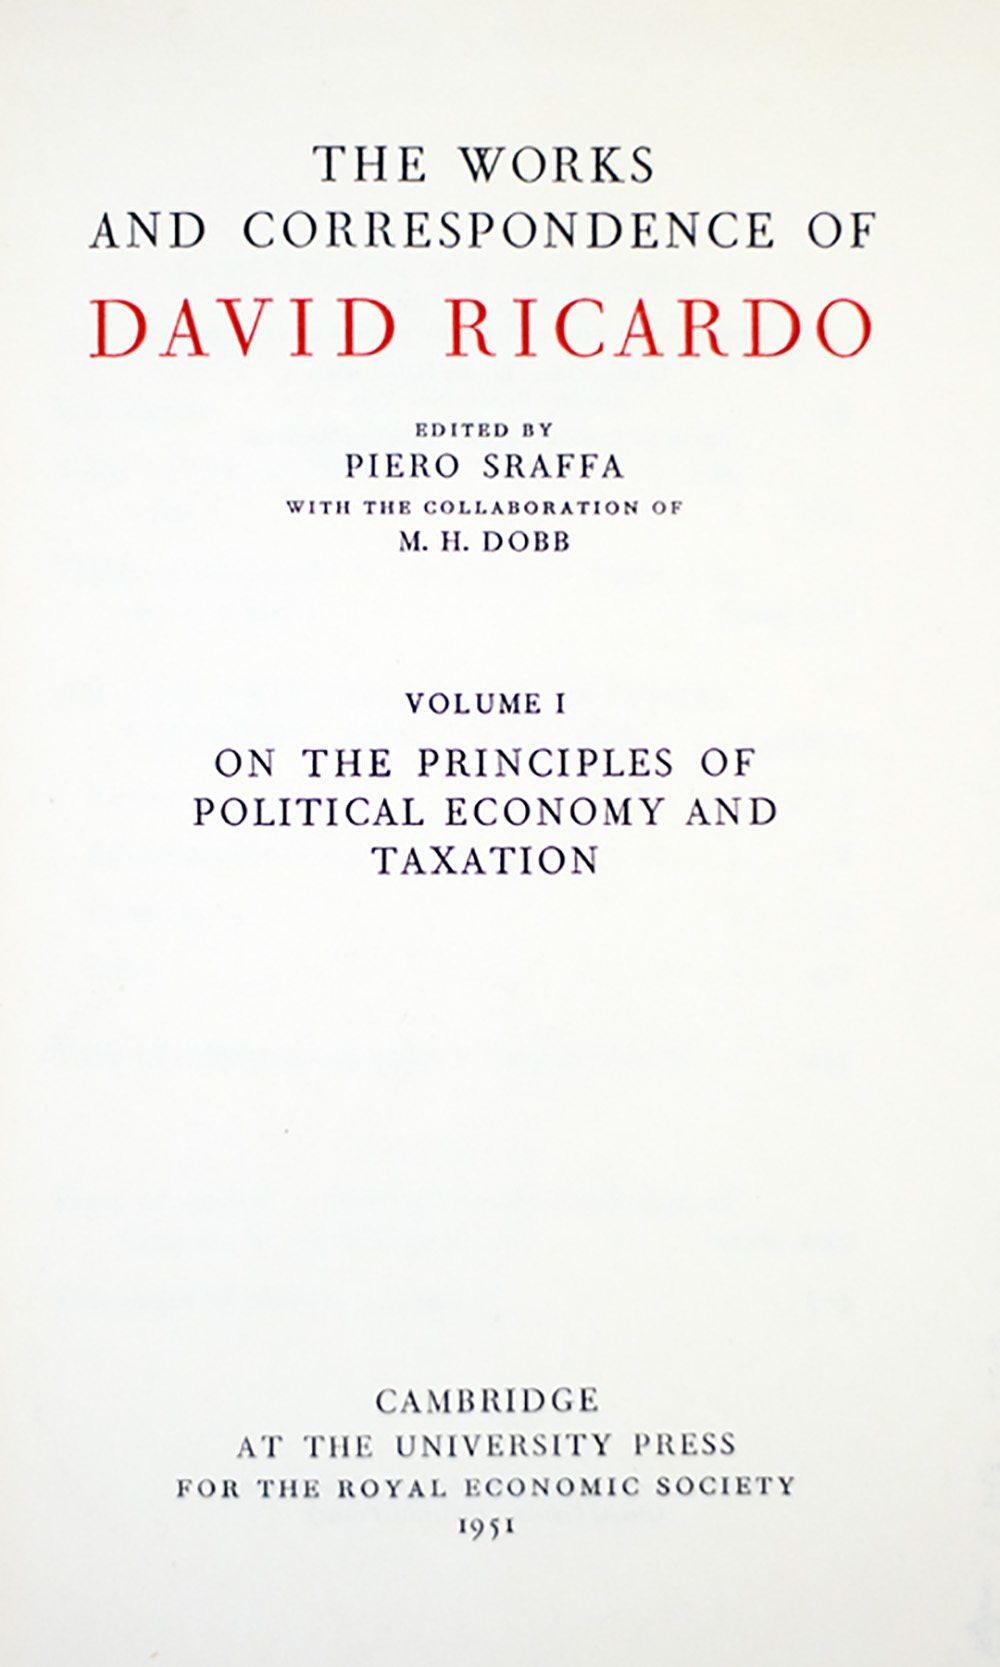 The Works And Correspondence Of David Ricardo.